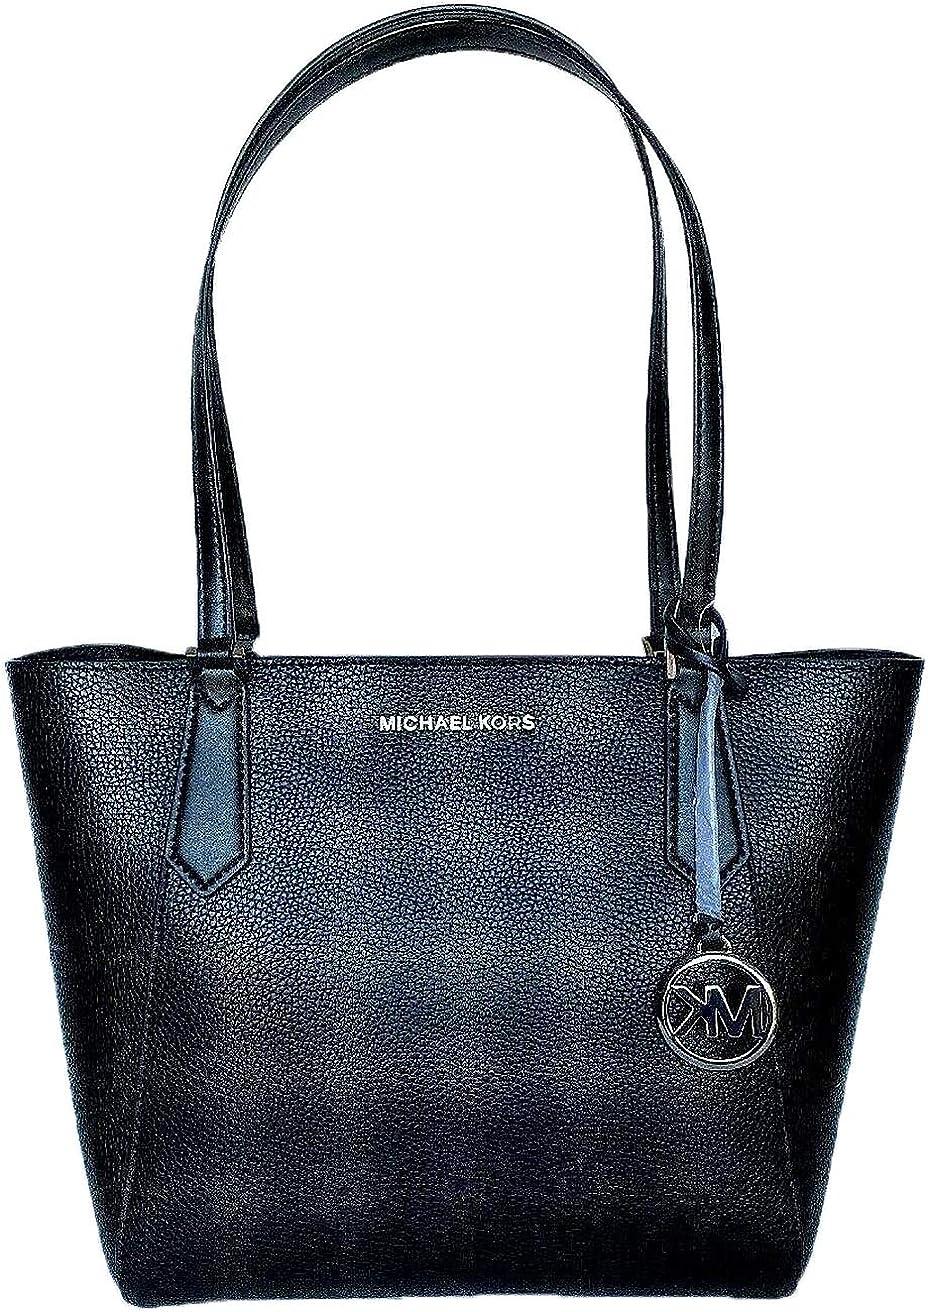 Michael Kors Women's Kiberly Small Bonded Black Leather Tote, O/S